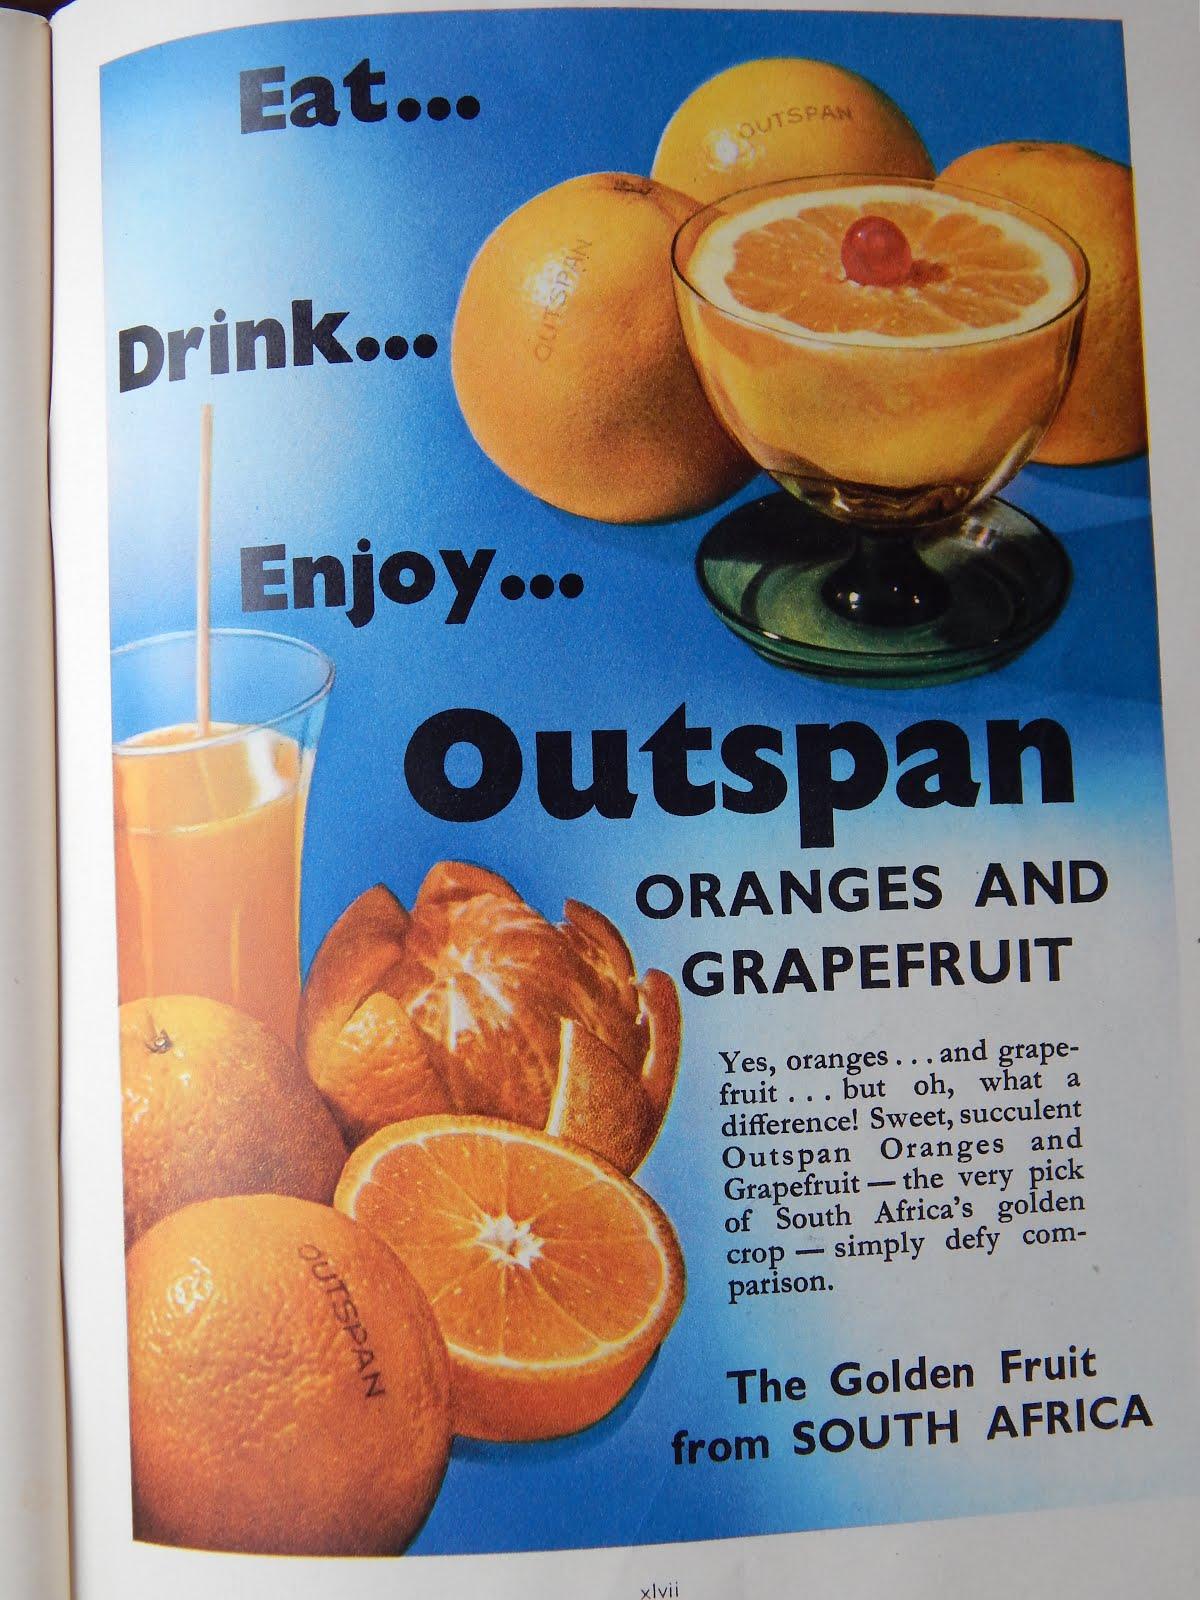 Get your vitamin C